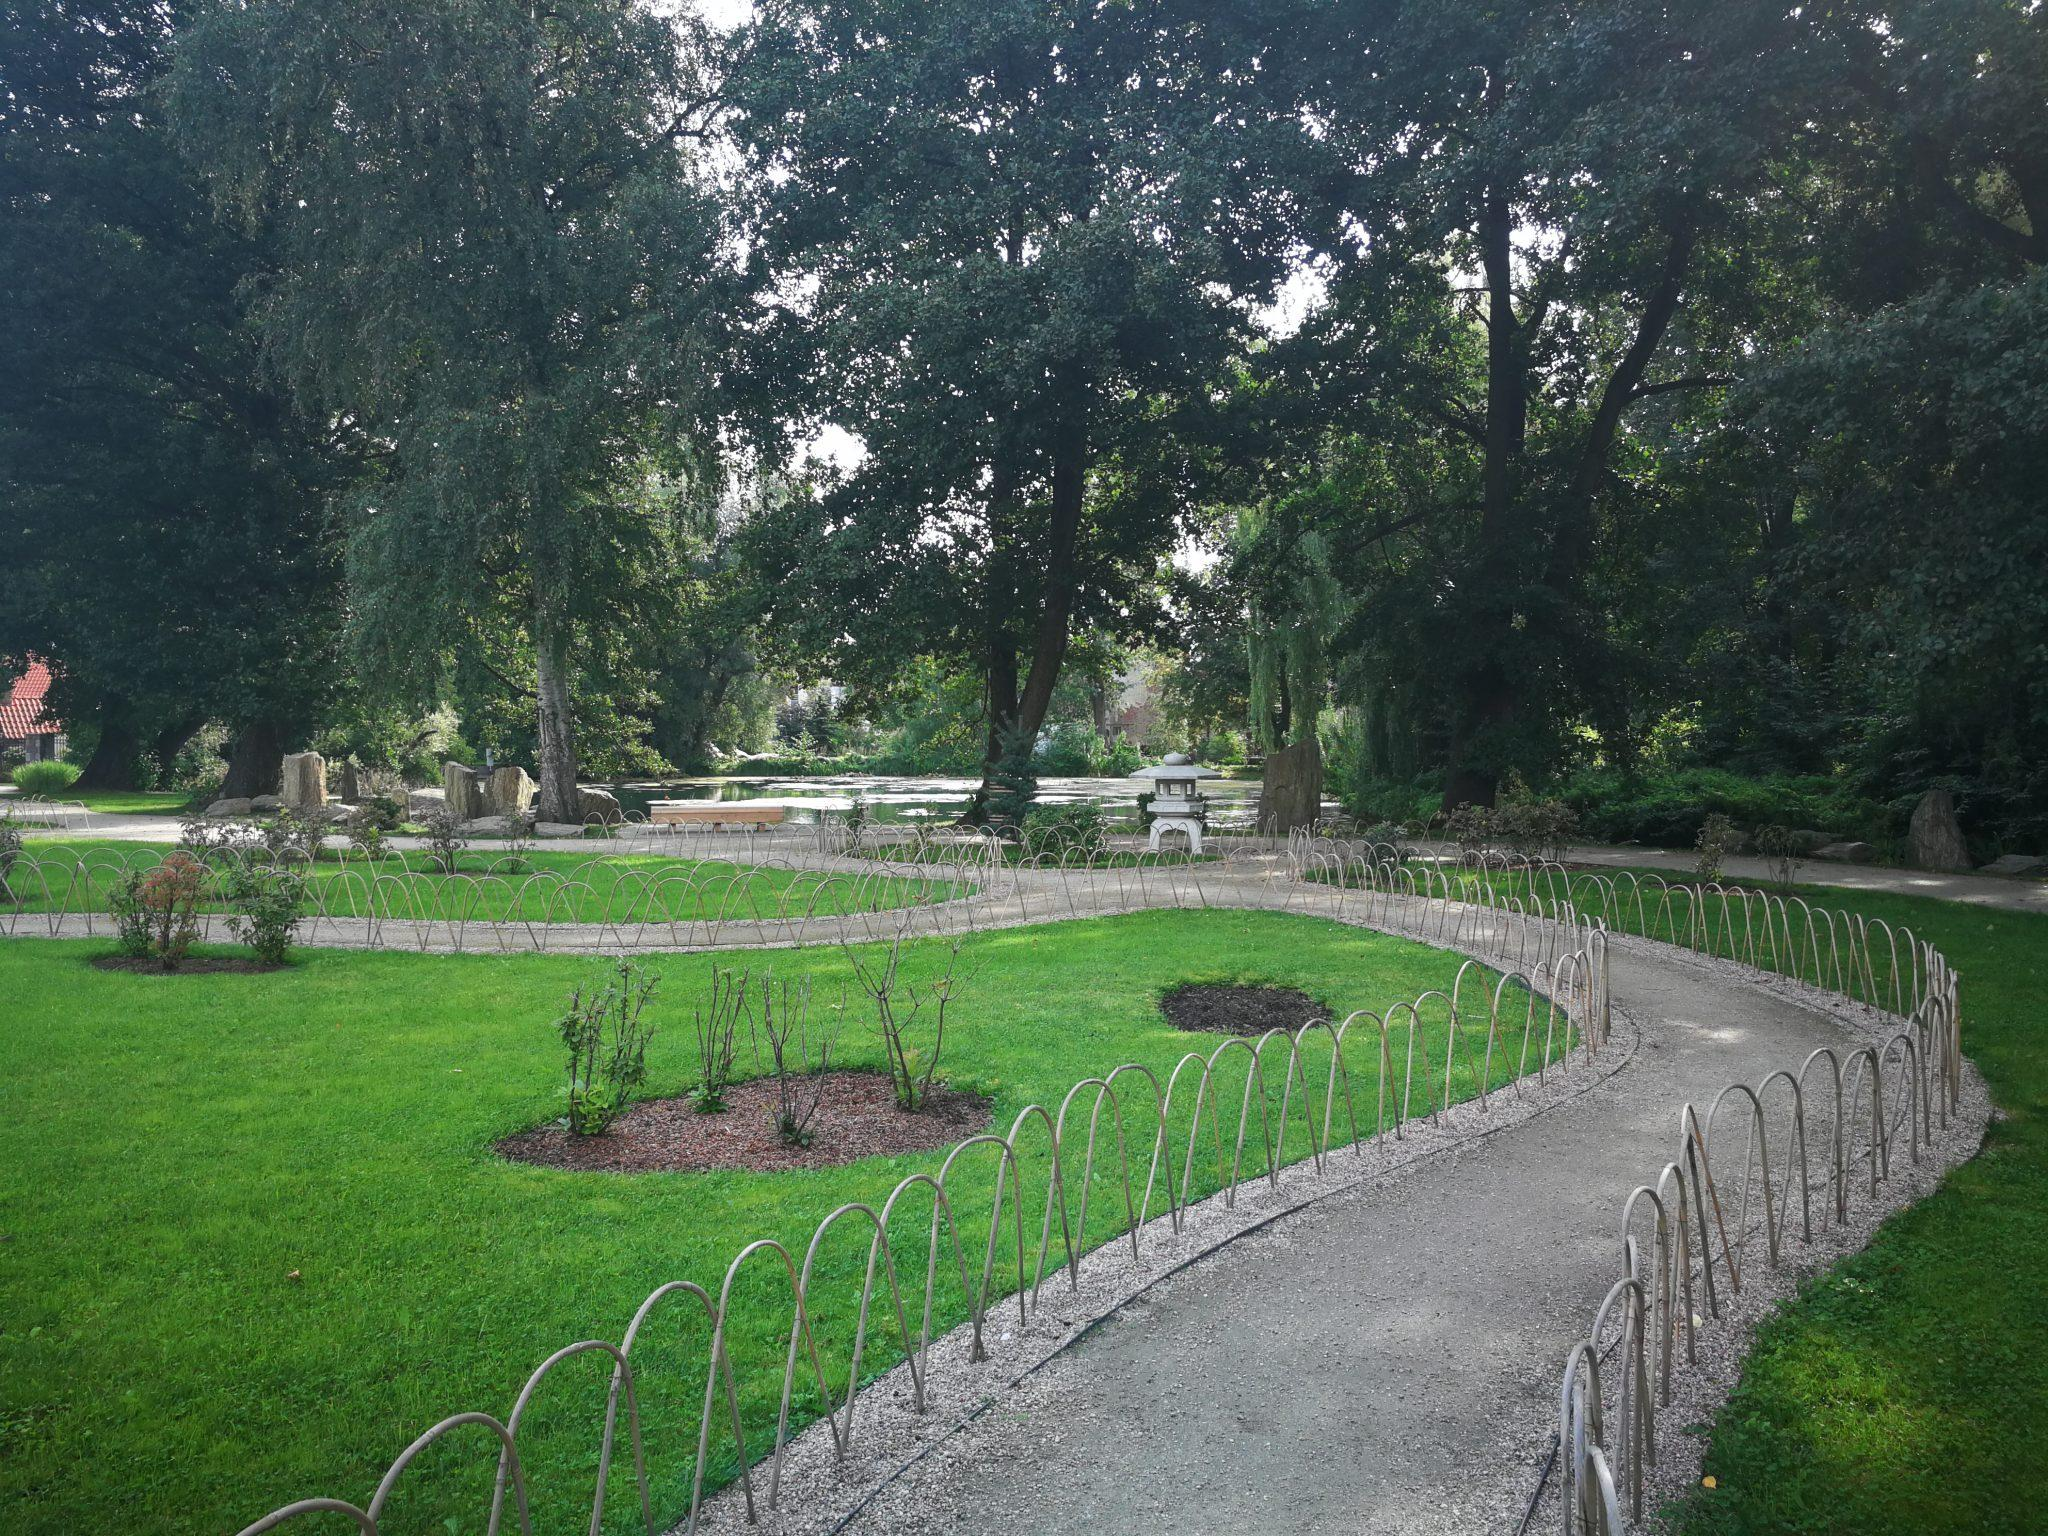 Ogrod Japonski W Parku Oliwskim W Gdansku Tour Guide Service Gdansk